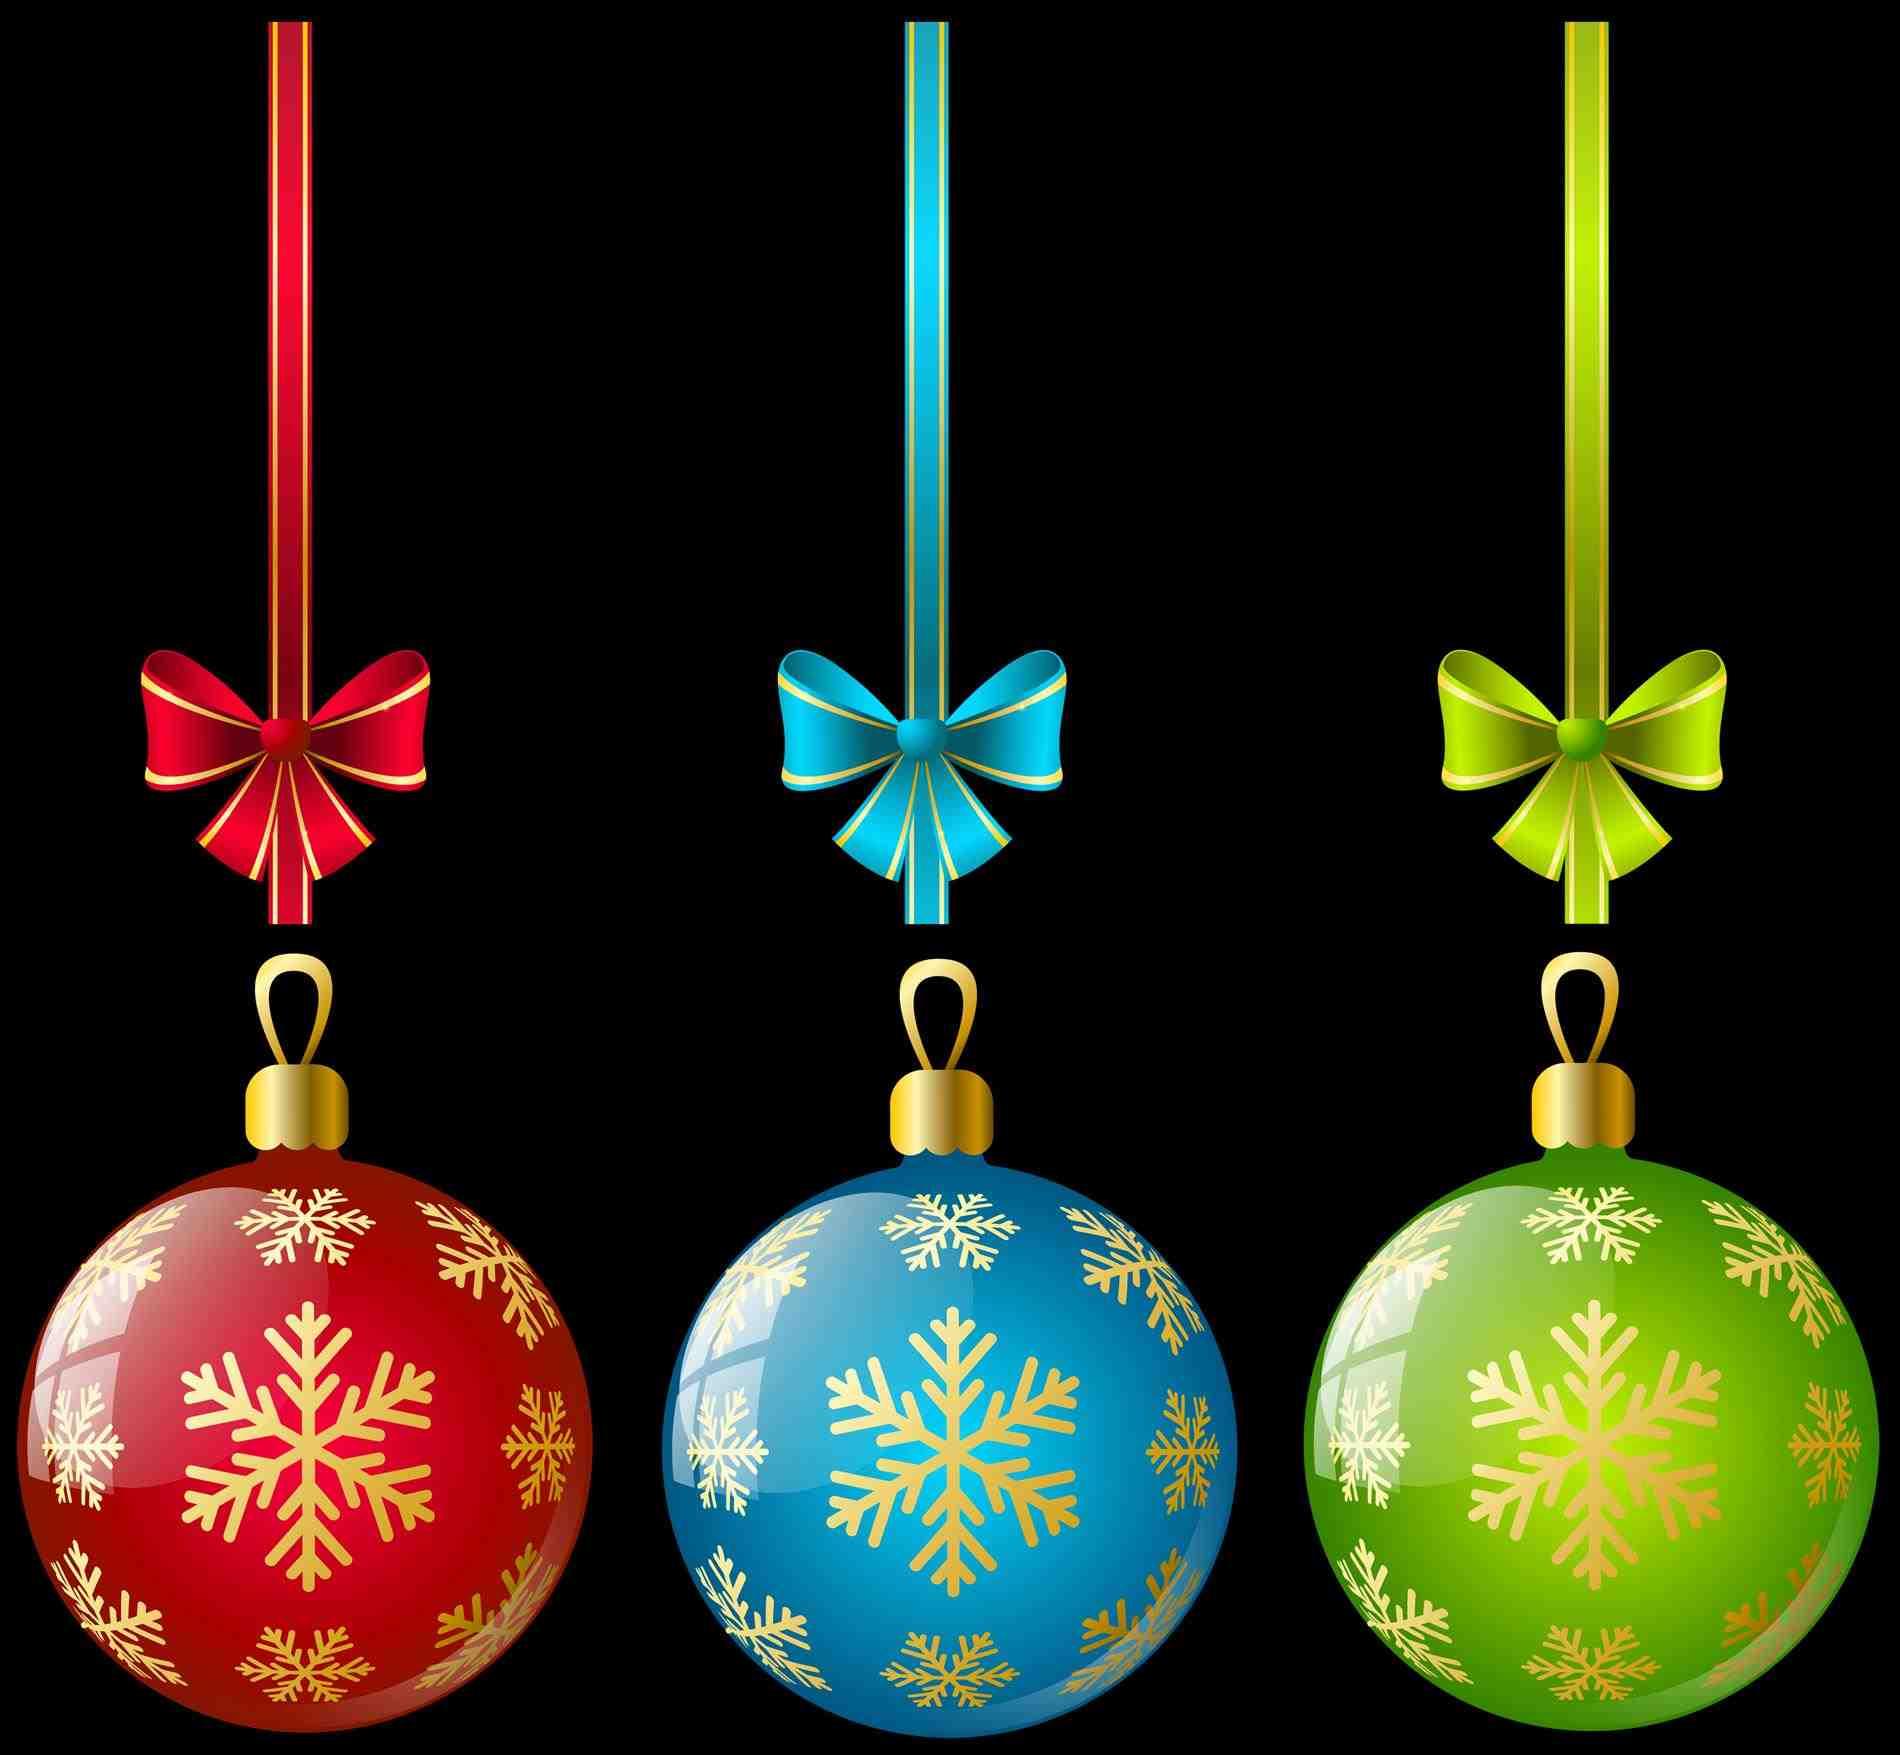 1900x1755 Christmas Ornaments Clipart Border Cheminee.website